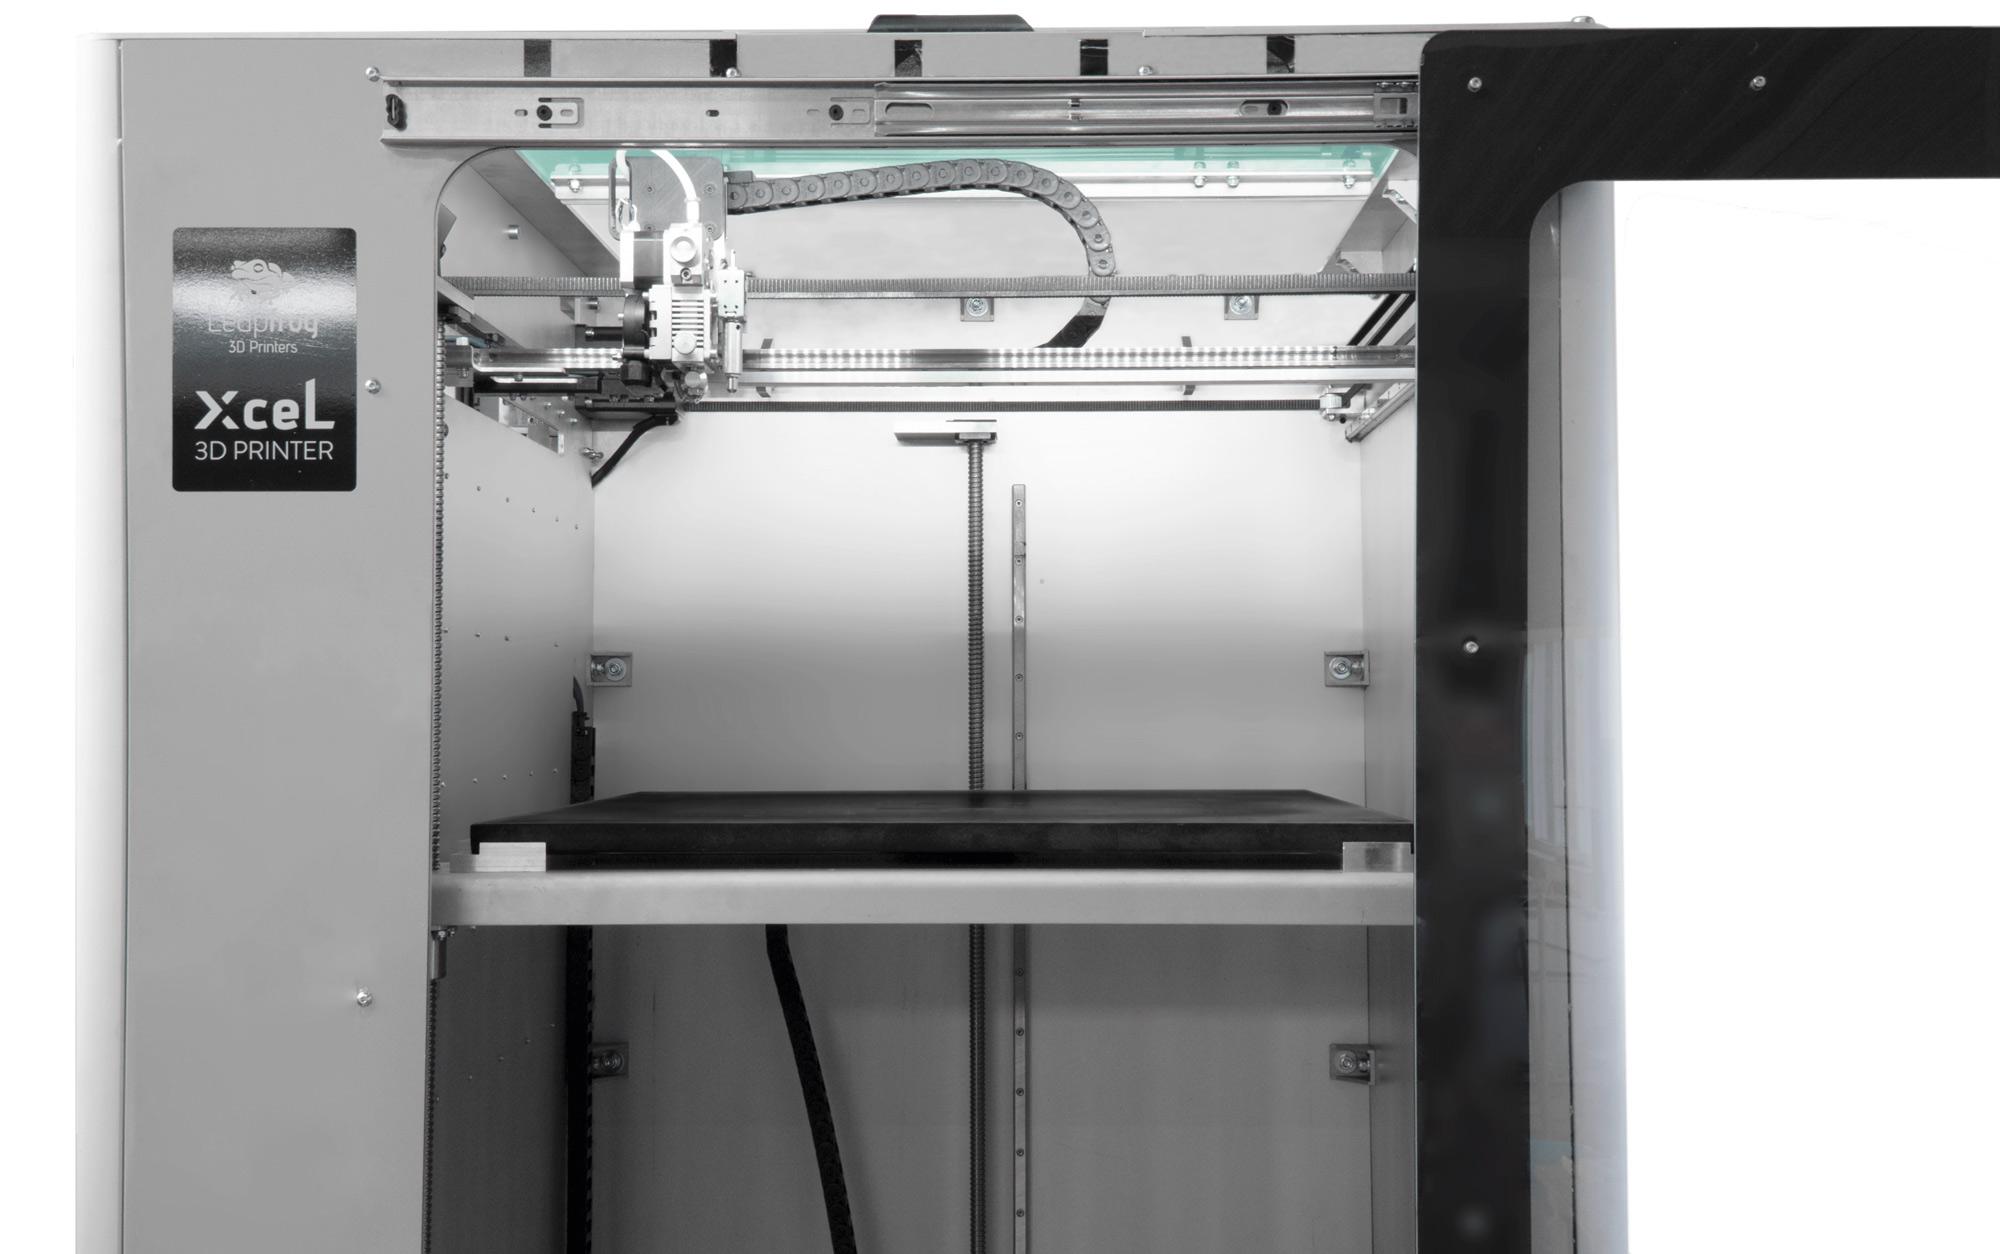 Closed Heat Environment Leapfrog XceL 3D Printer